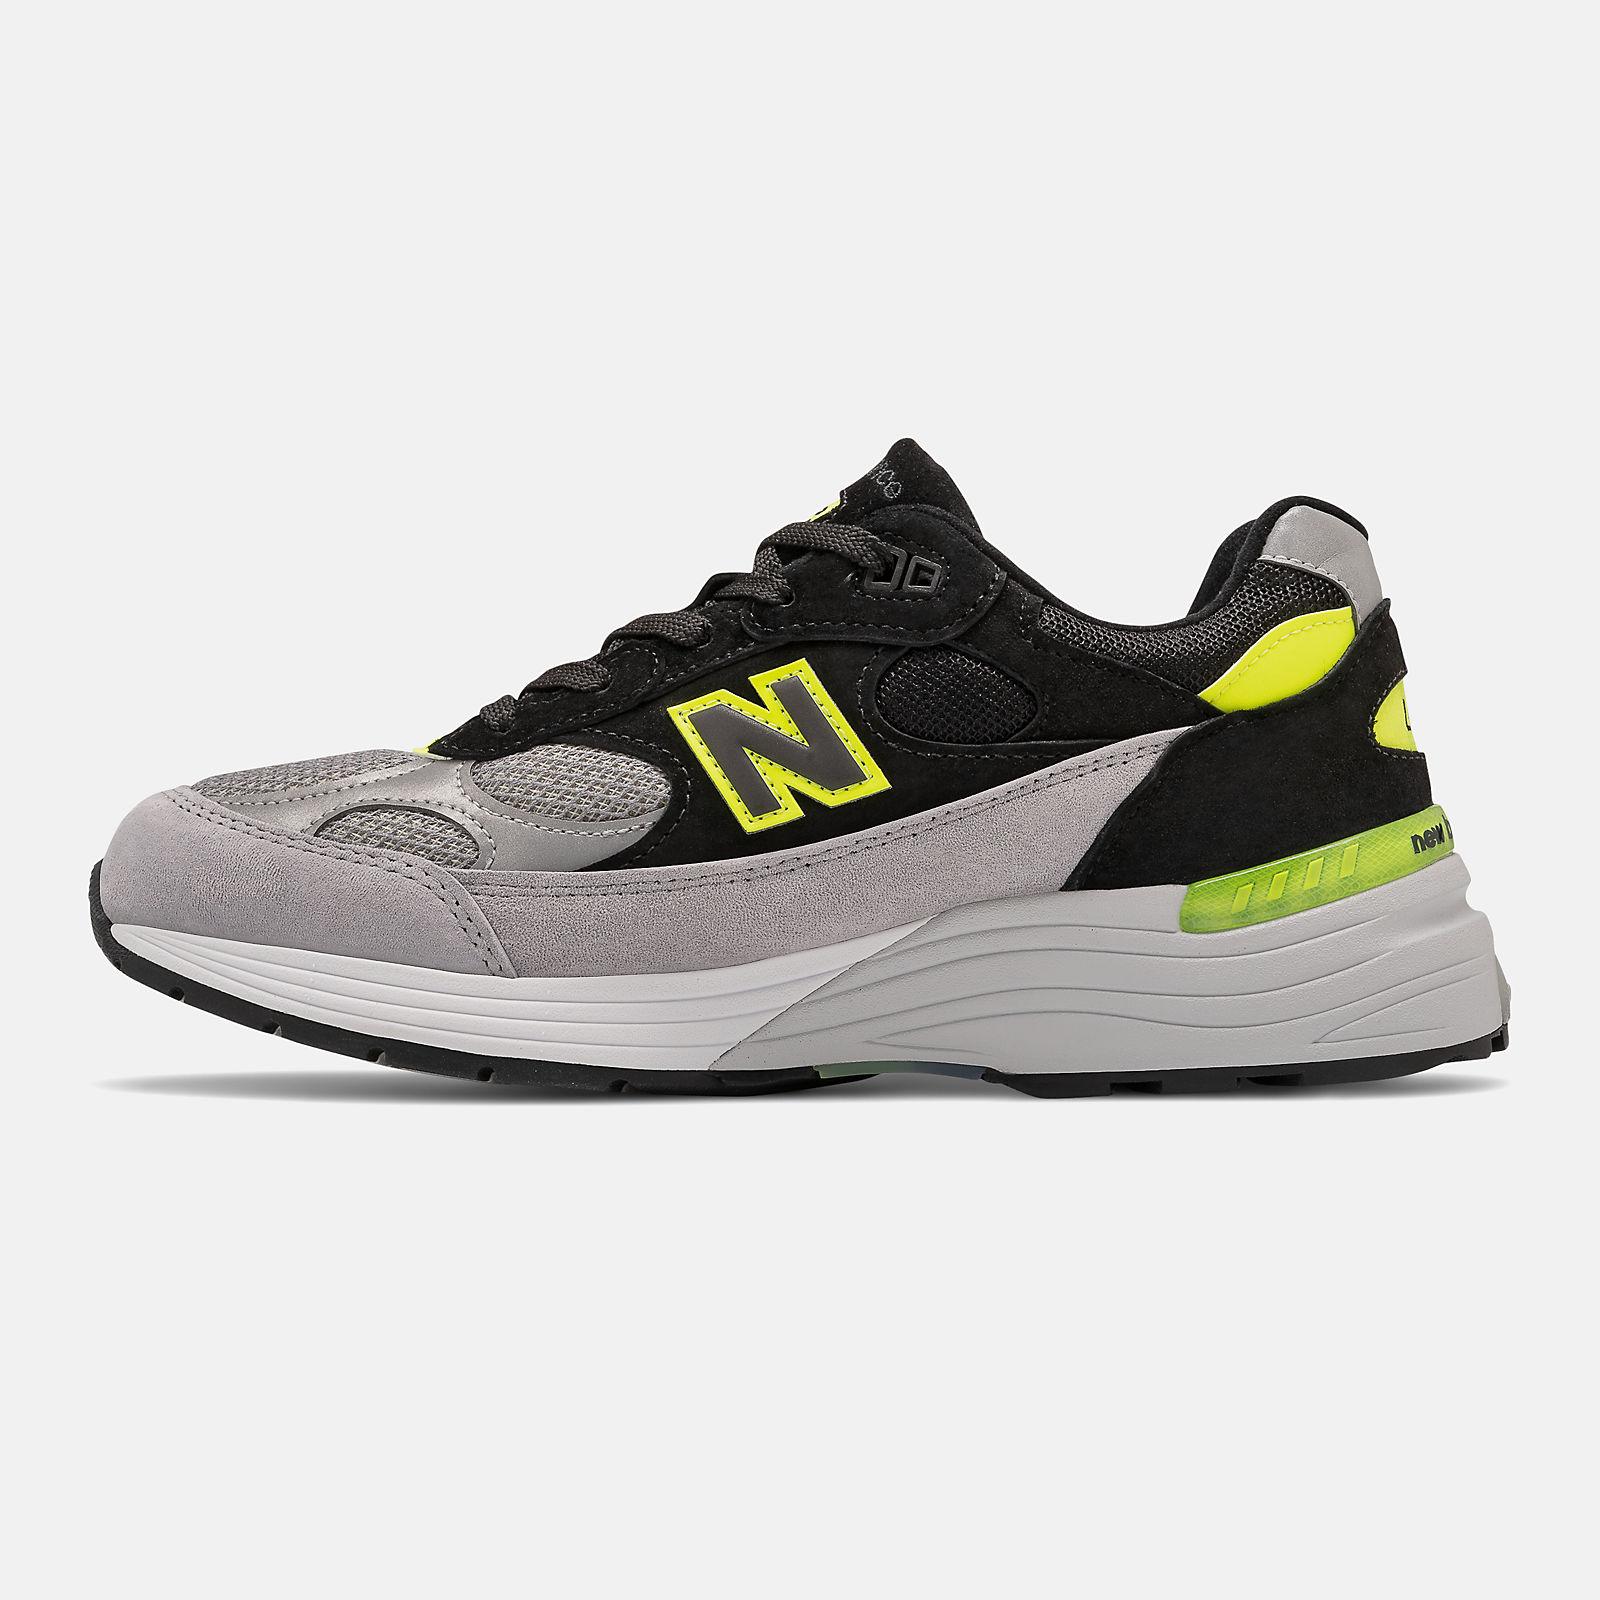 992 new balance